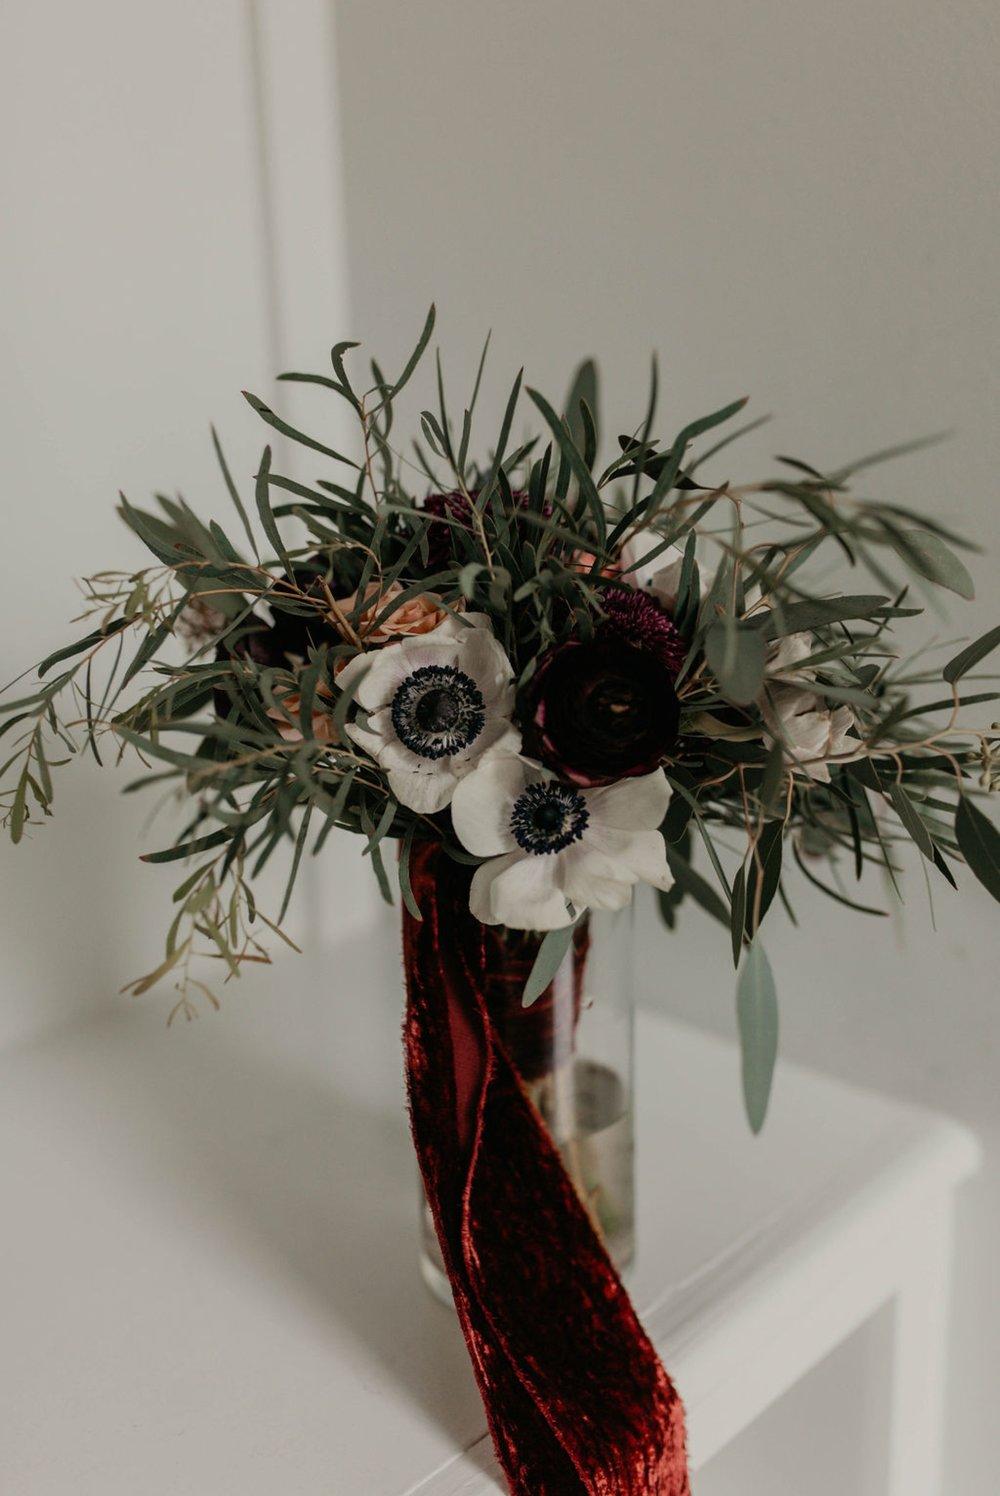 Bridal Bouquet with Matt Smarsh and Johanna Dye - Raleigh North Carolina Urban Edgy Downtown Wedding